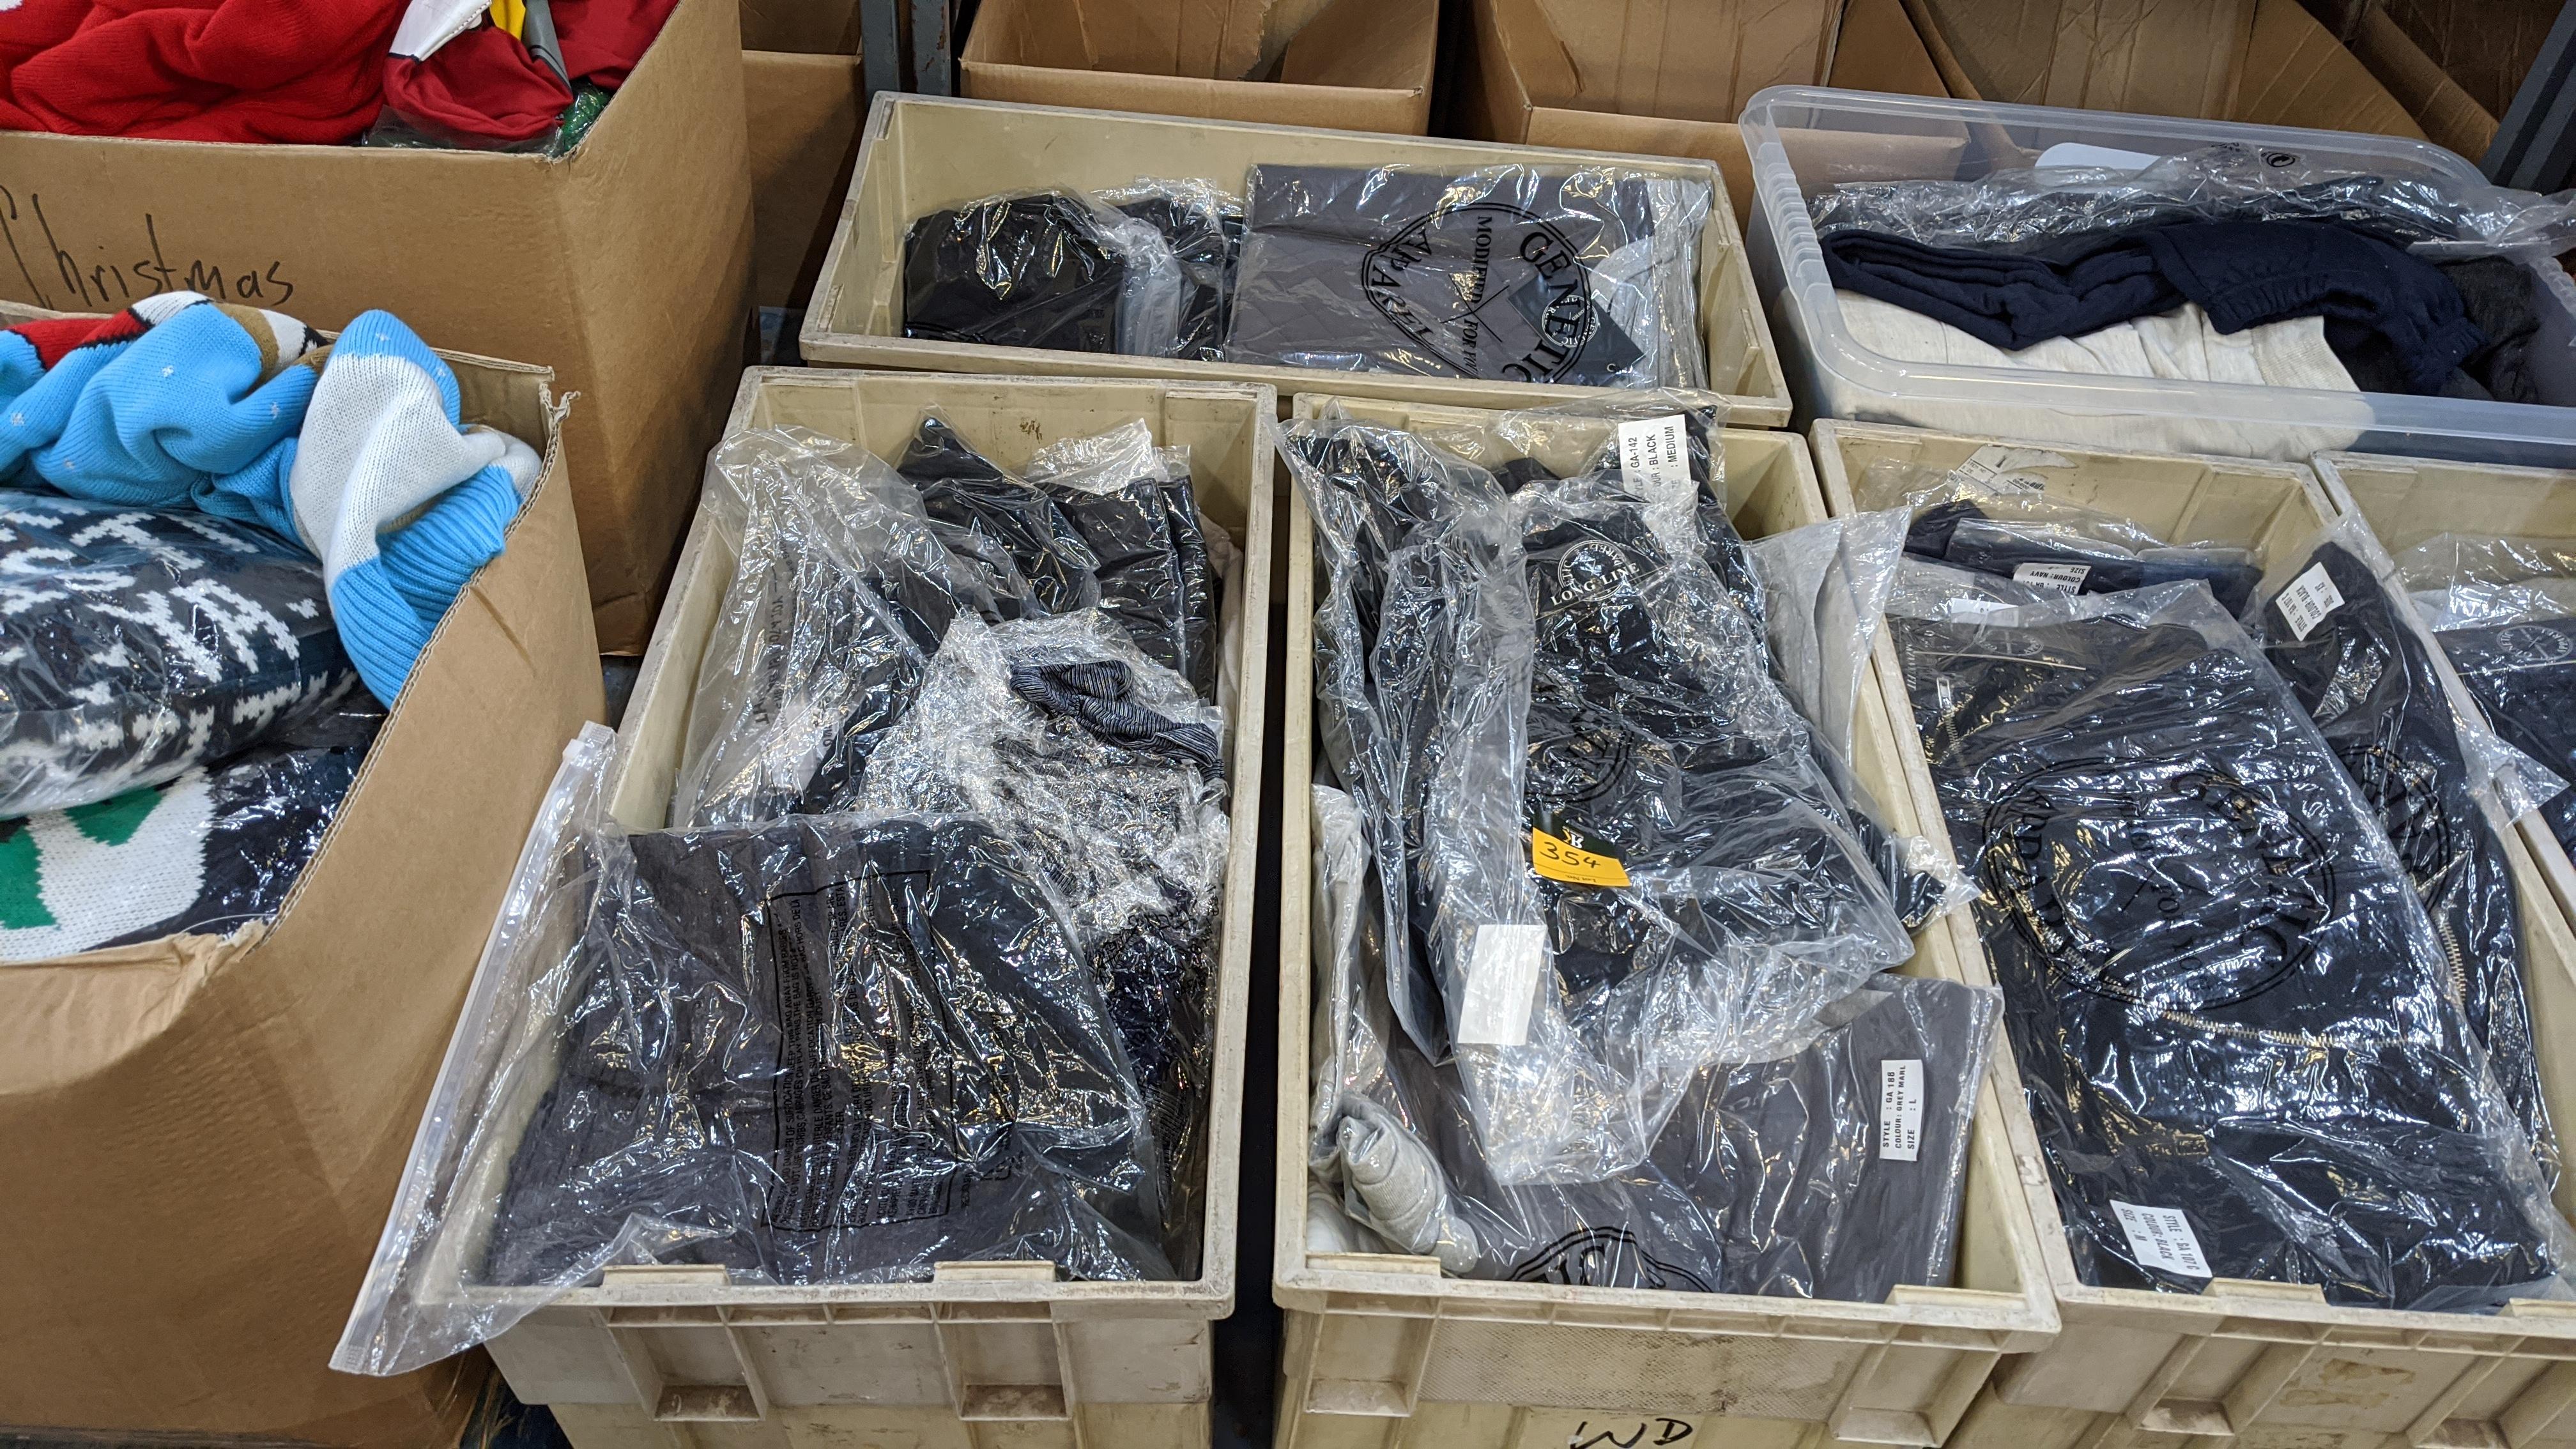 Very large quantity of primarily men's designer clothing & accessories. - Image 117 of 157